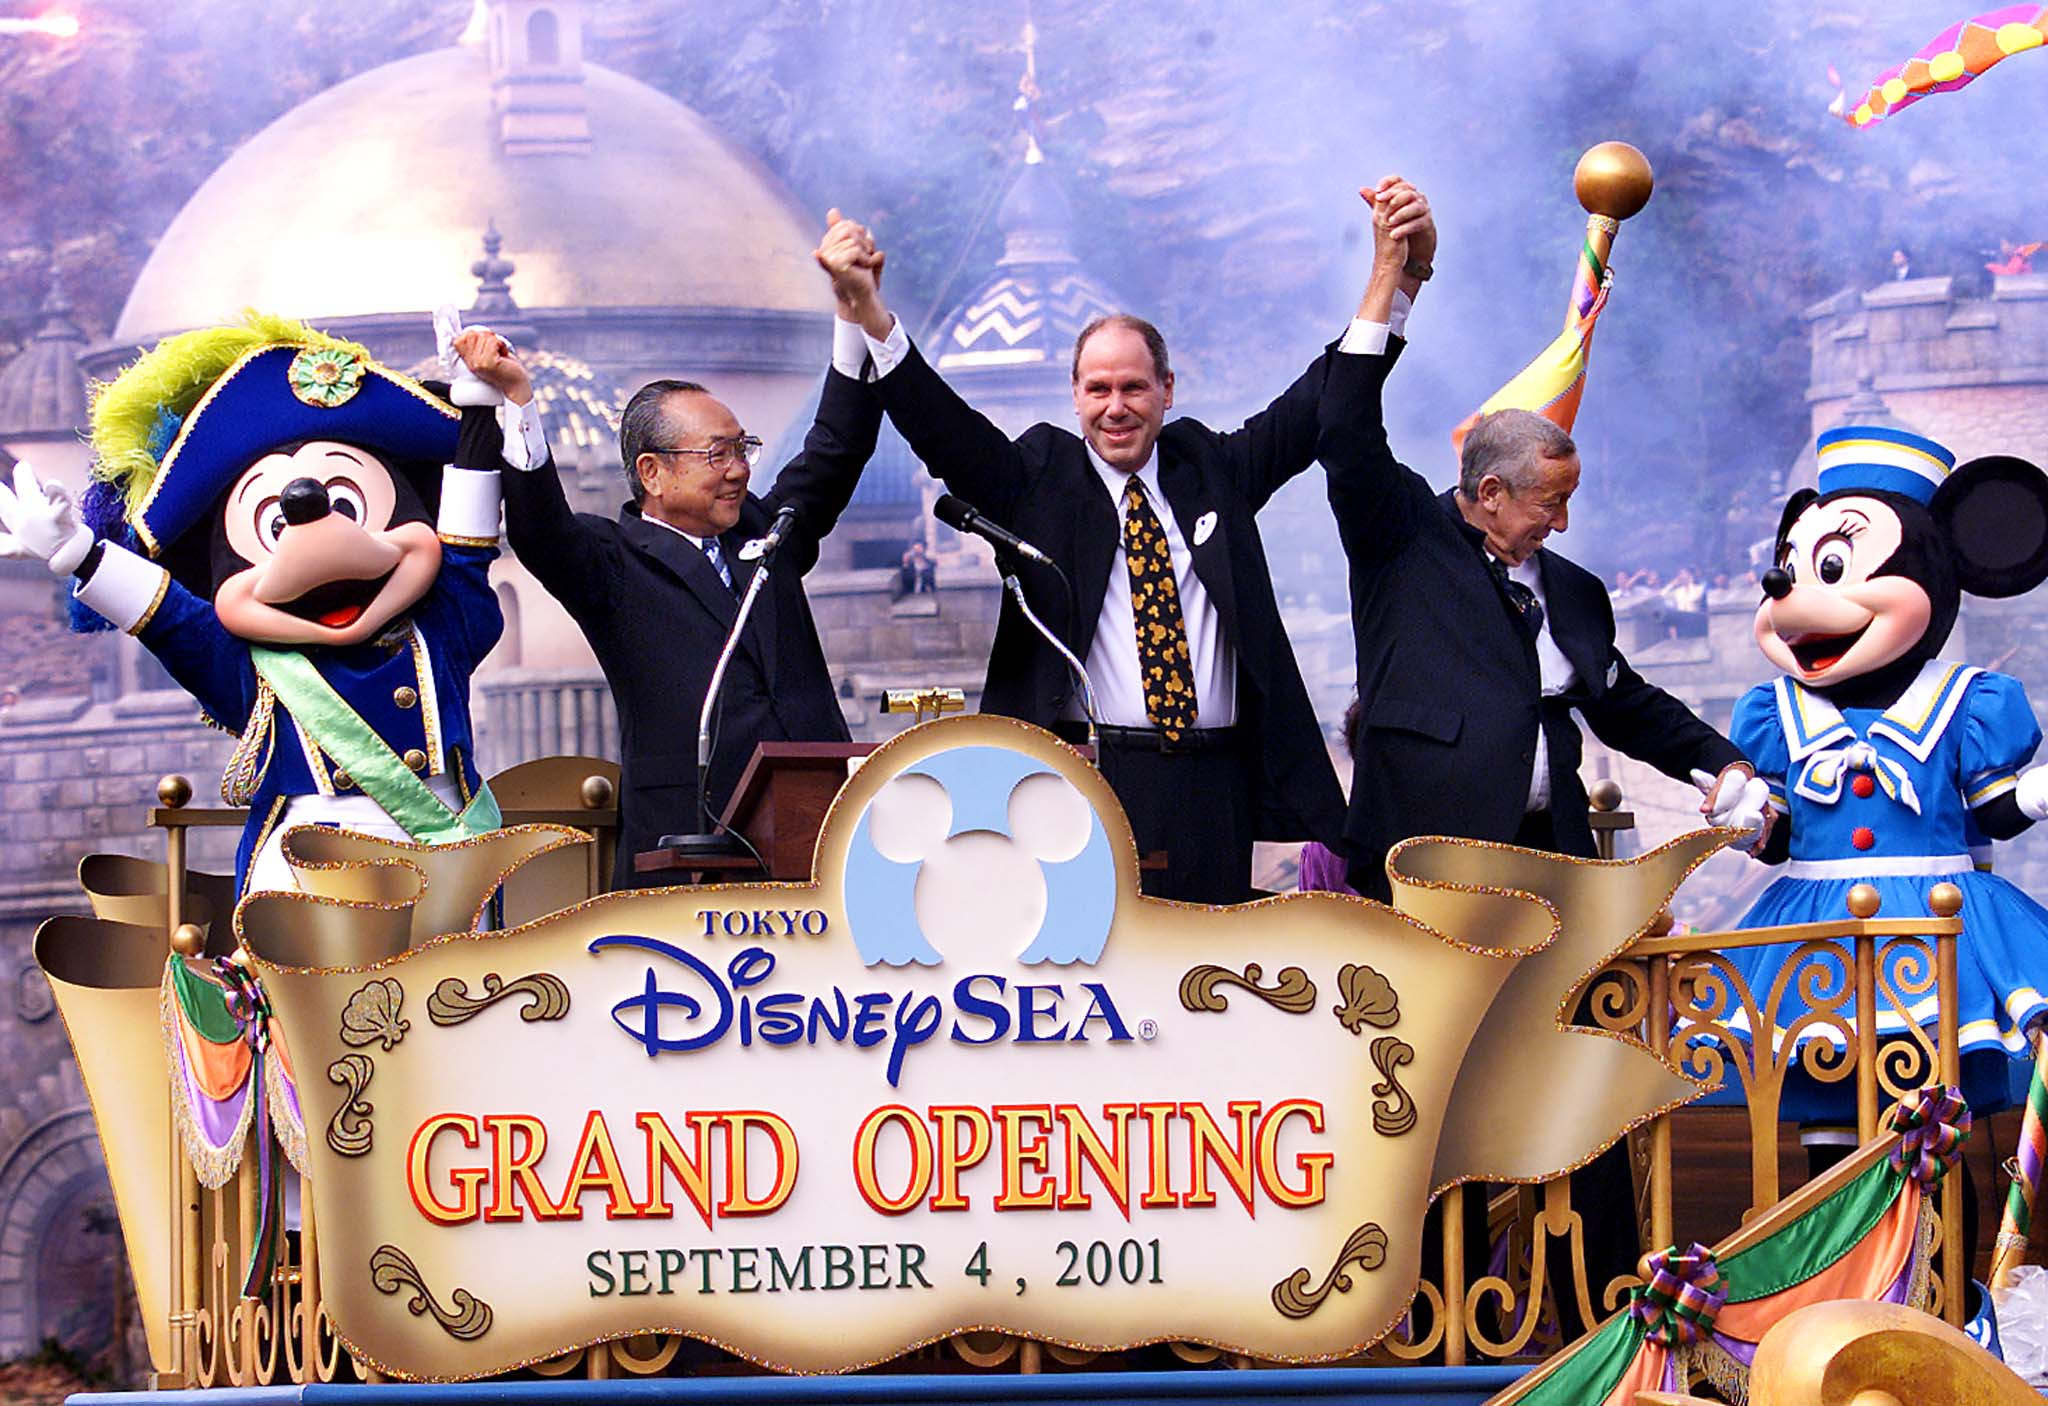 DisneySea Park in Japan